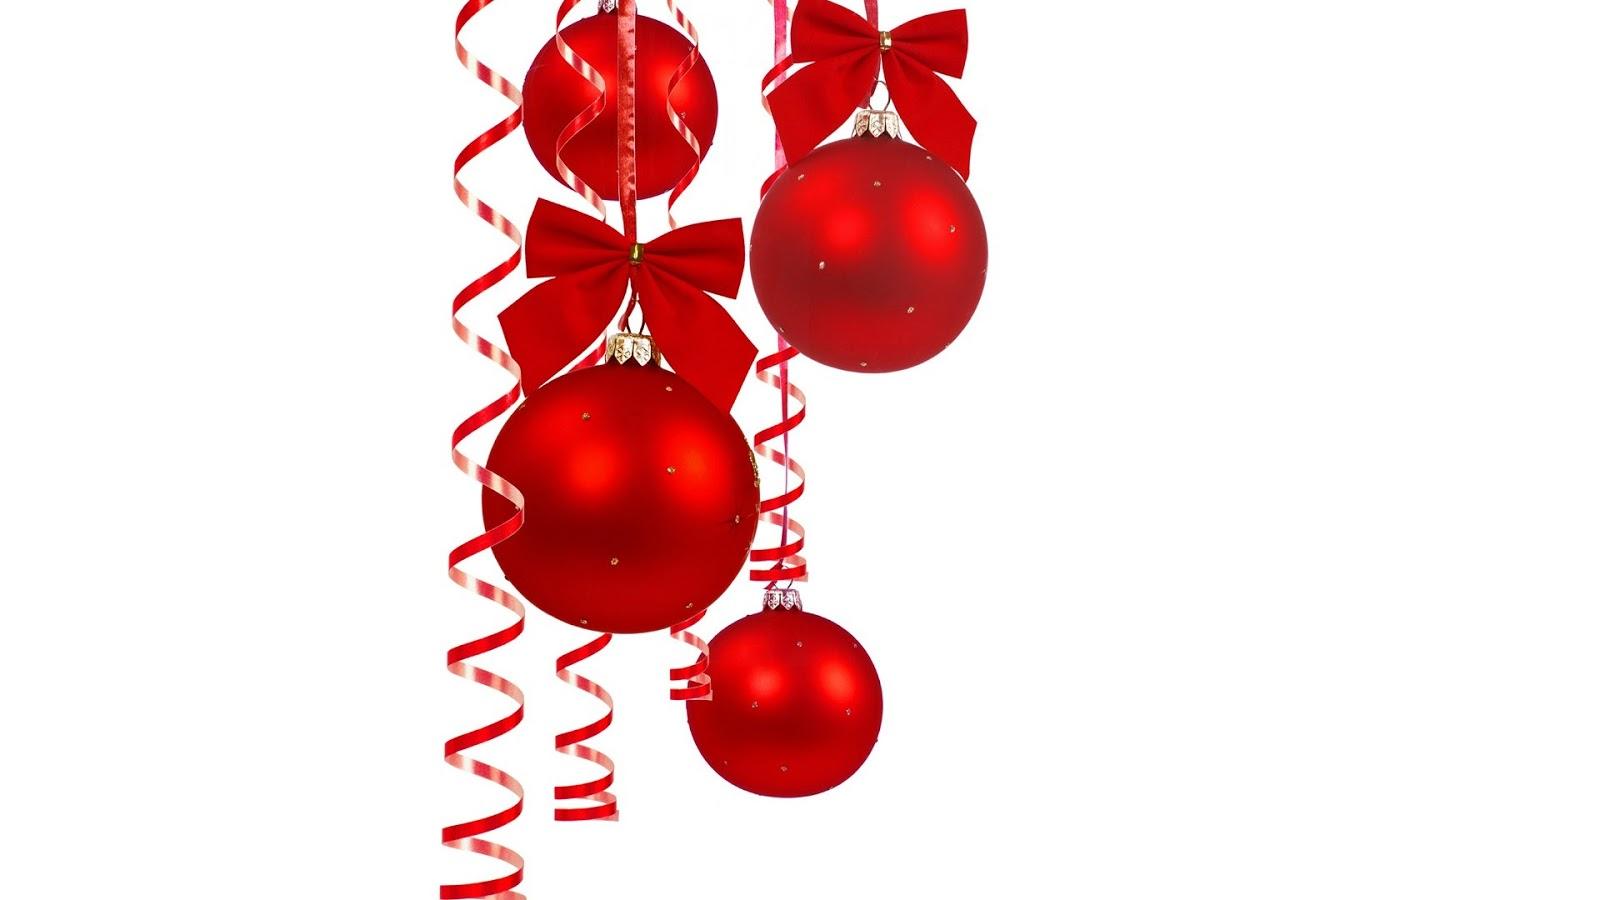 Christmas Microsoft Clip Art Free Downlo-Christmas Microsoft Clip Art Free Downloads | School Clipart-3